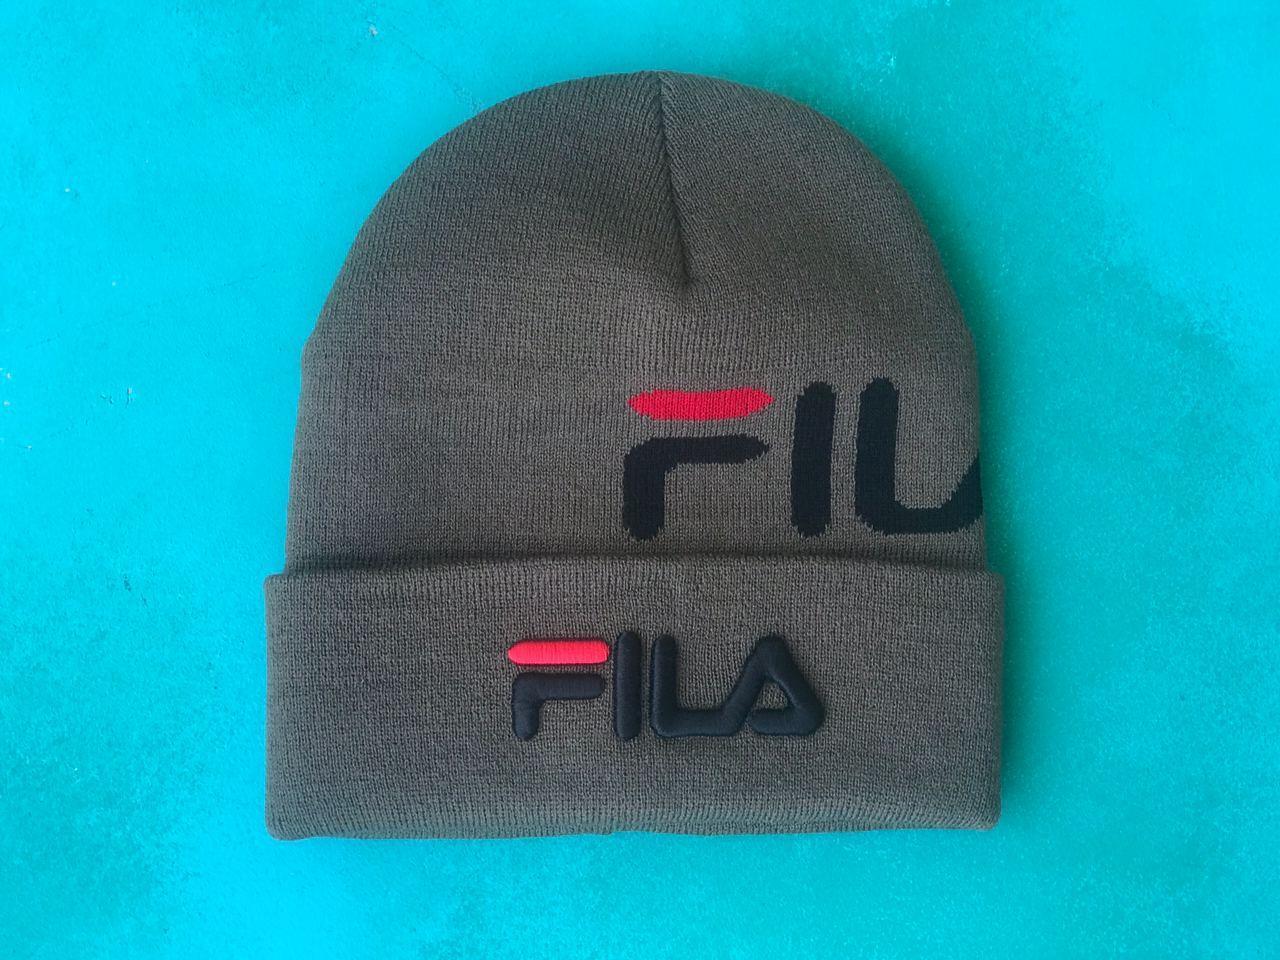 Шапка Fila  / шапка фила/ шапка женская/шапка мужская/хаки